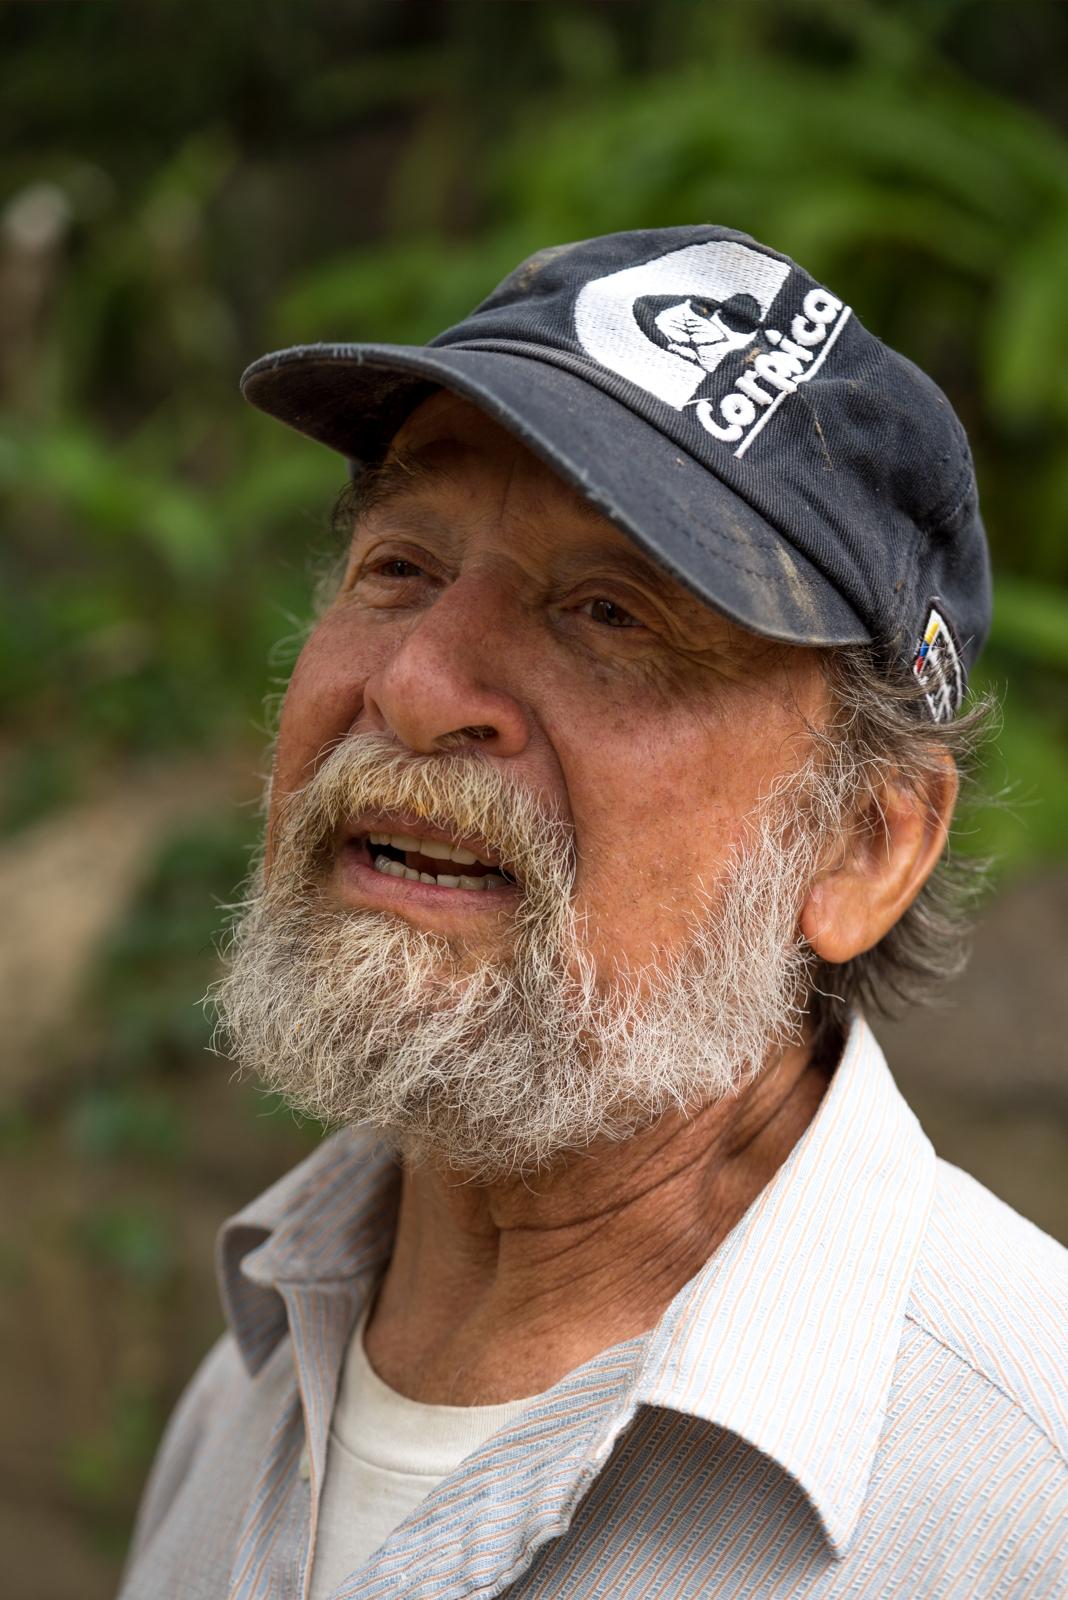 ChuCho Rodriguez